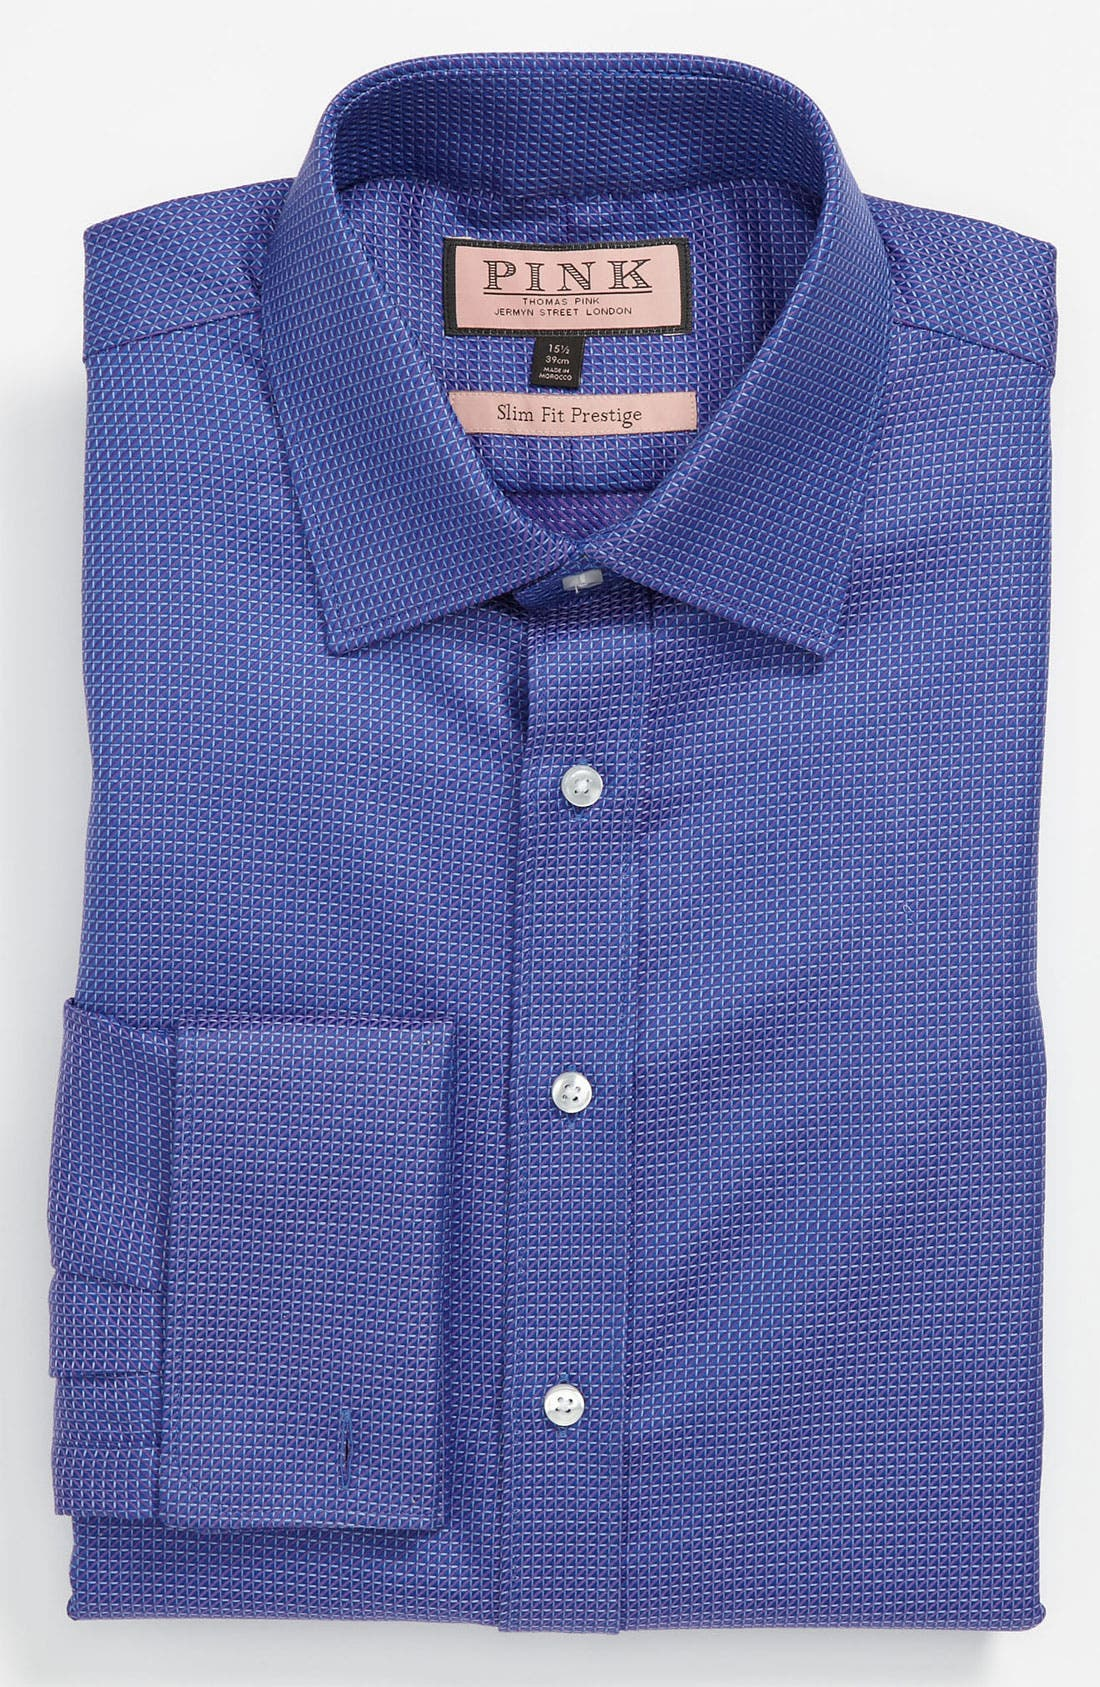 Alternate Image 1 Selected - Thomas Pink Slim Fit Prestige Dress Shirt